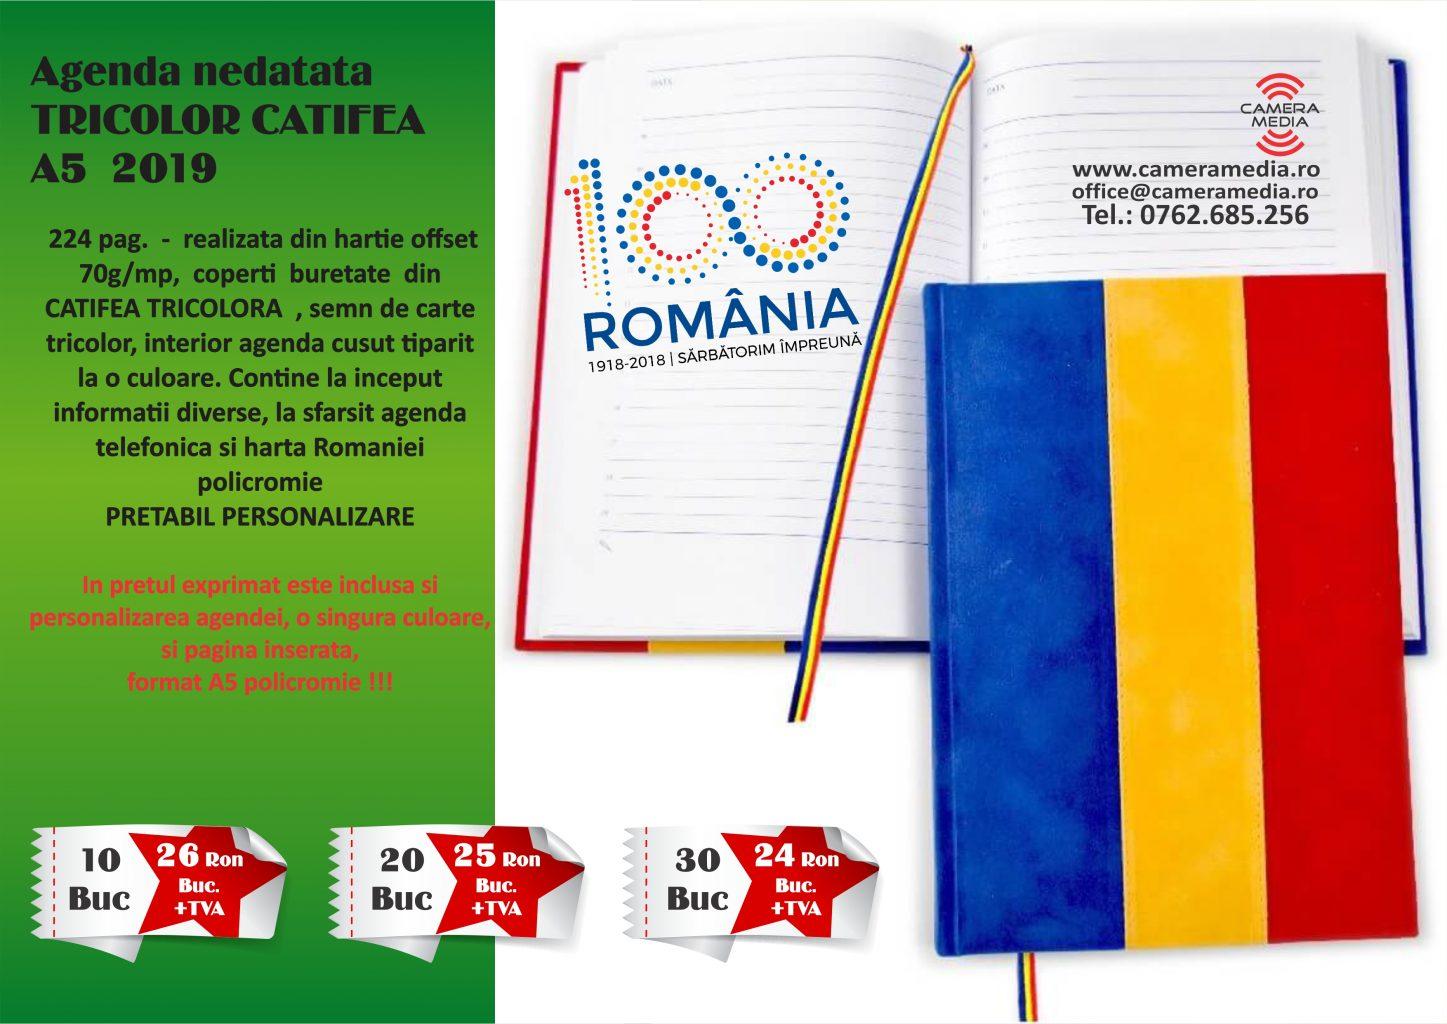 Agenda nedatata Tricolor A5 Craiova Tiparituri Craiova Promotionale Craiova Calendare Personalizate Craiova 2019 agende Personalizate Craiova 2019